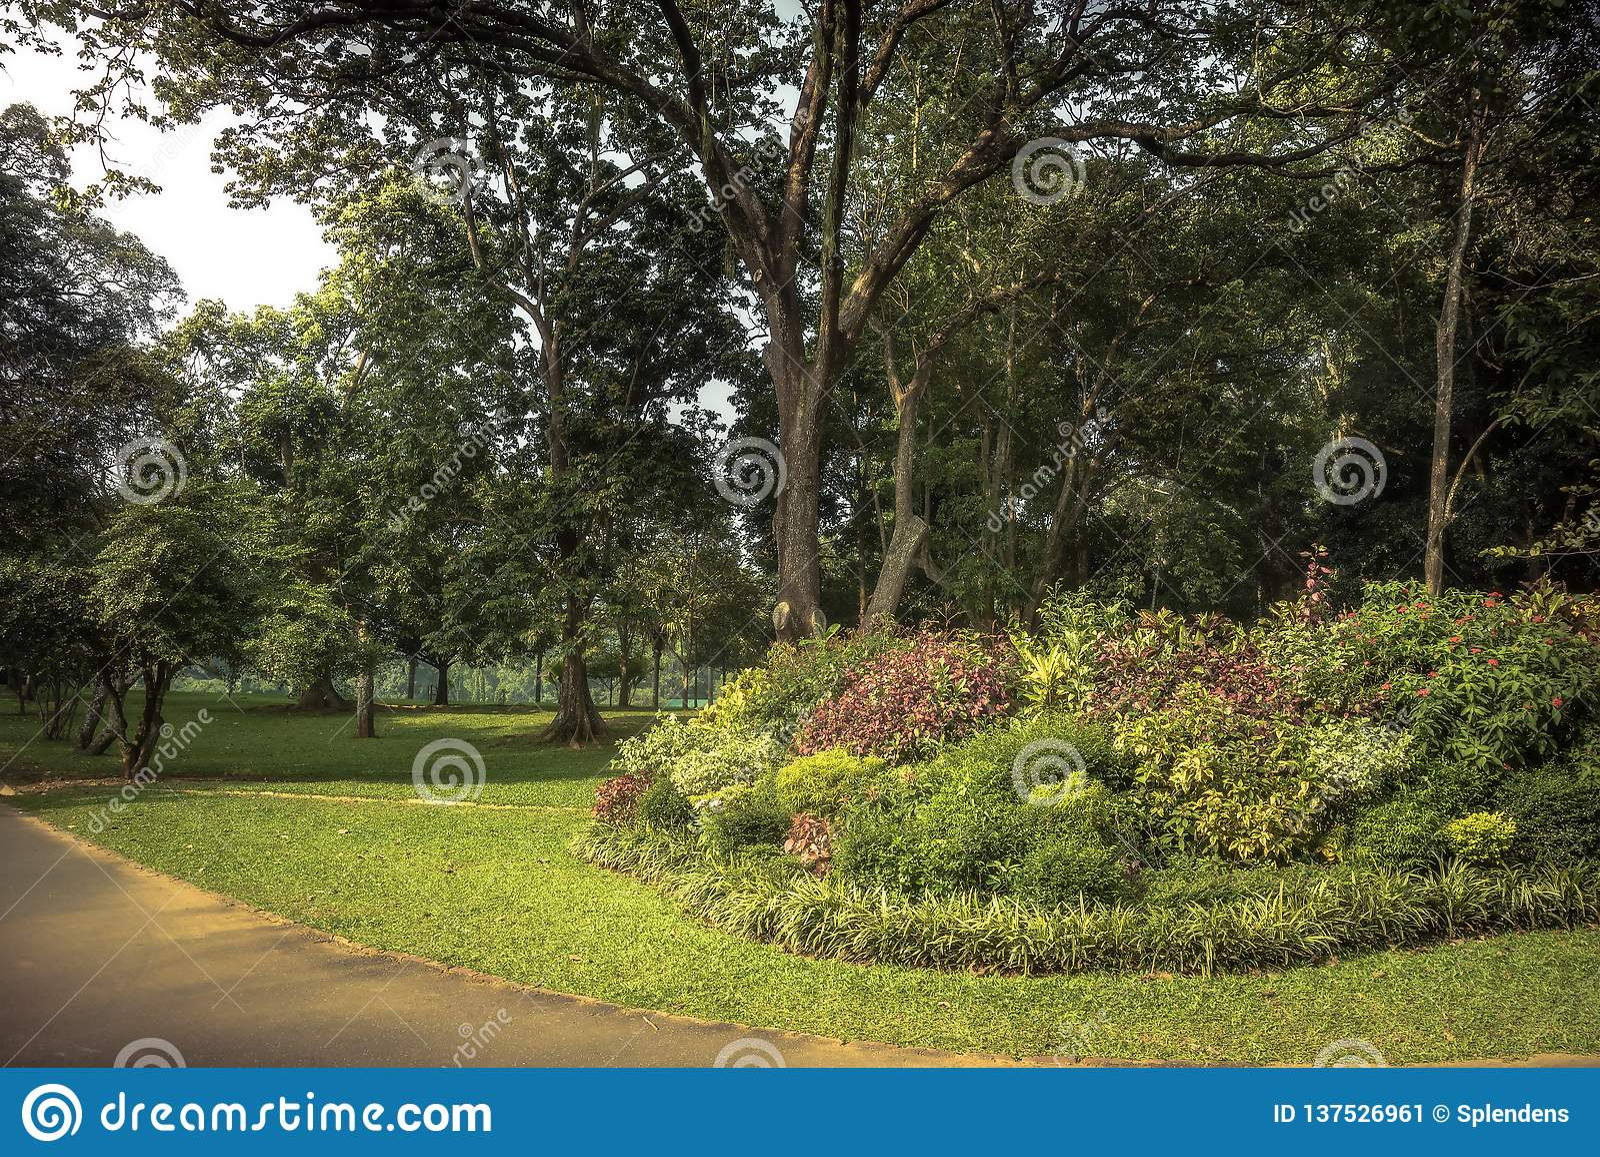 Lush Garden Scenery With Landscape Design In Royal Botanic Garden